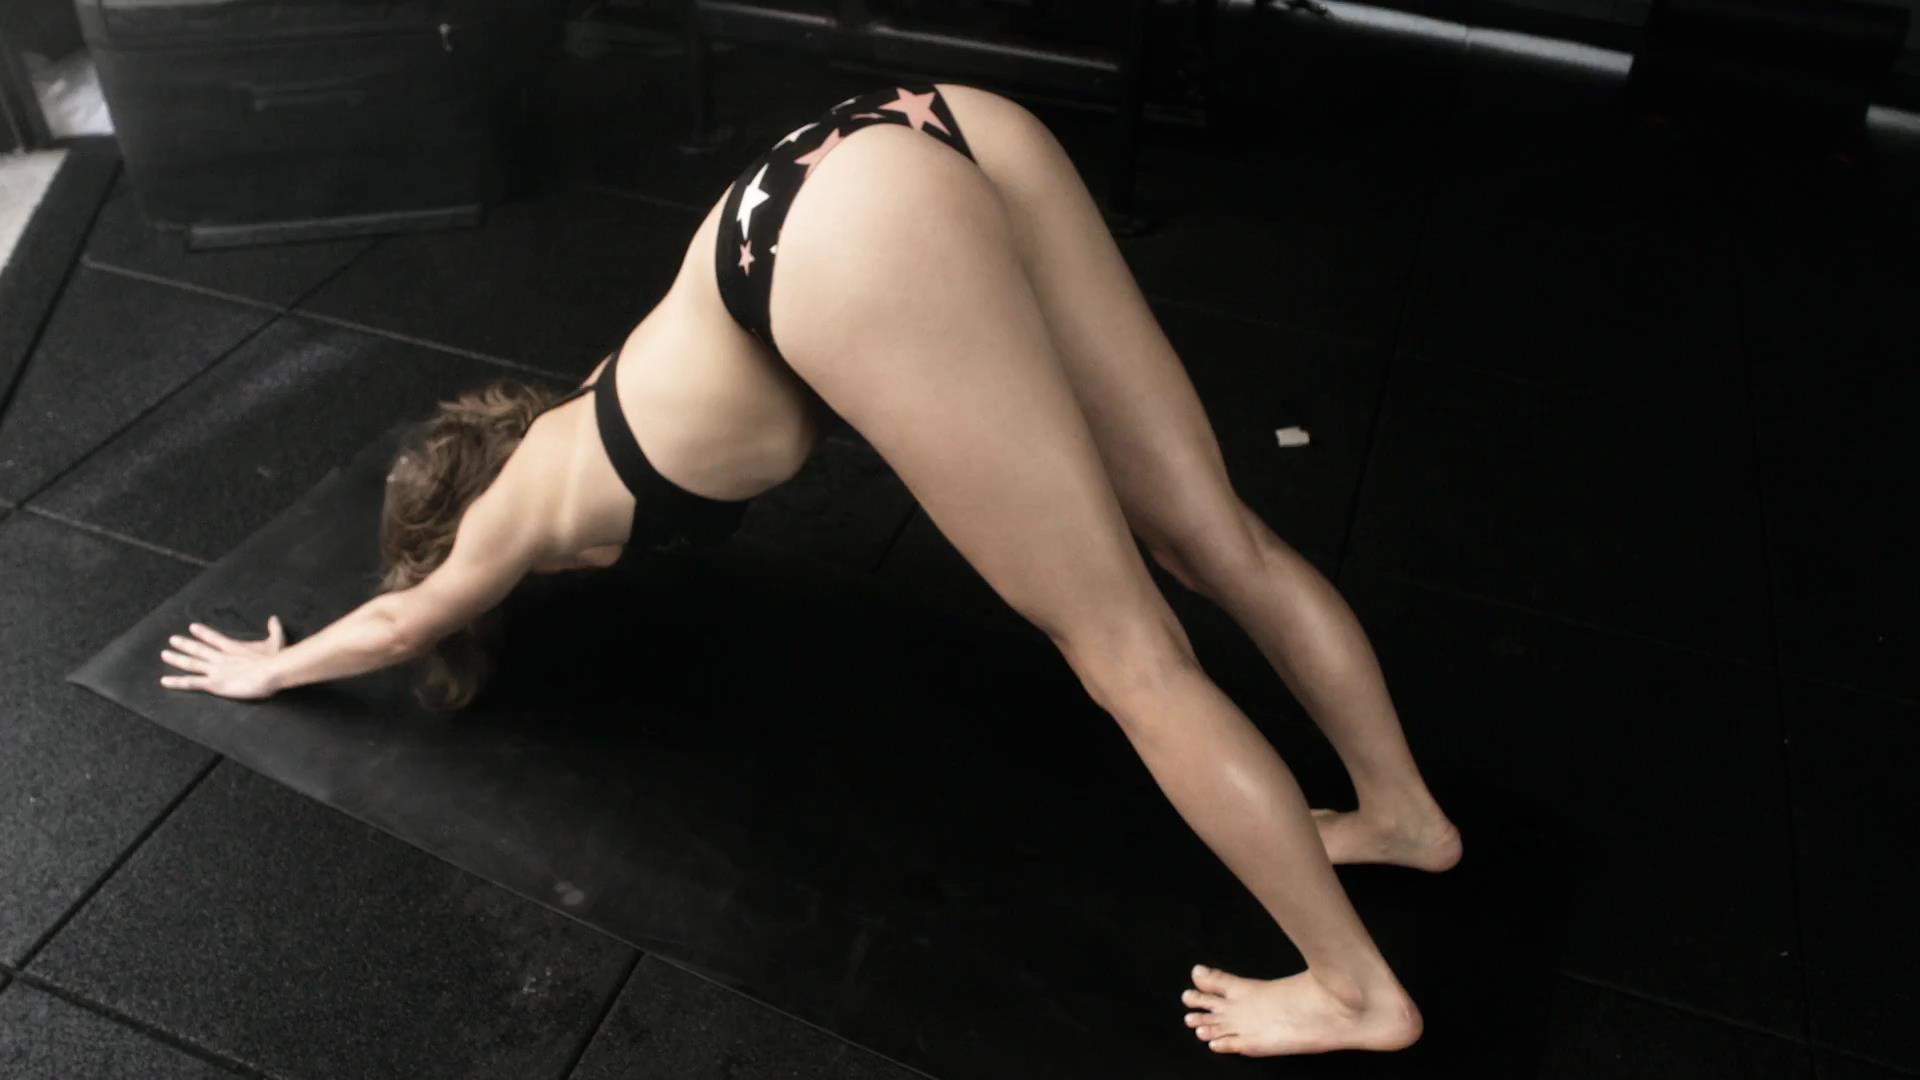 Tara babcock nude